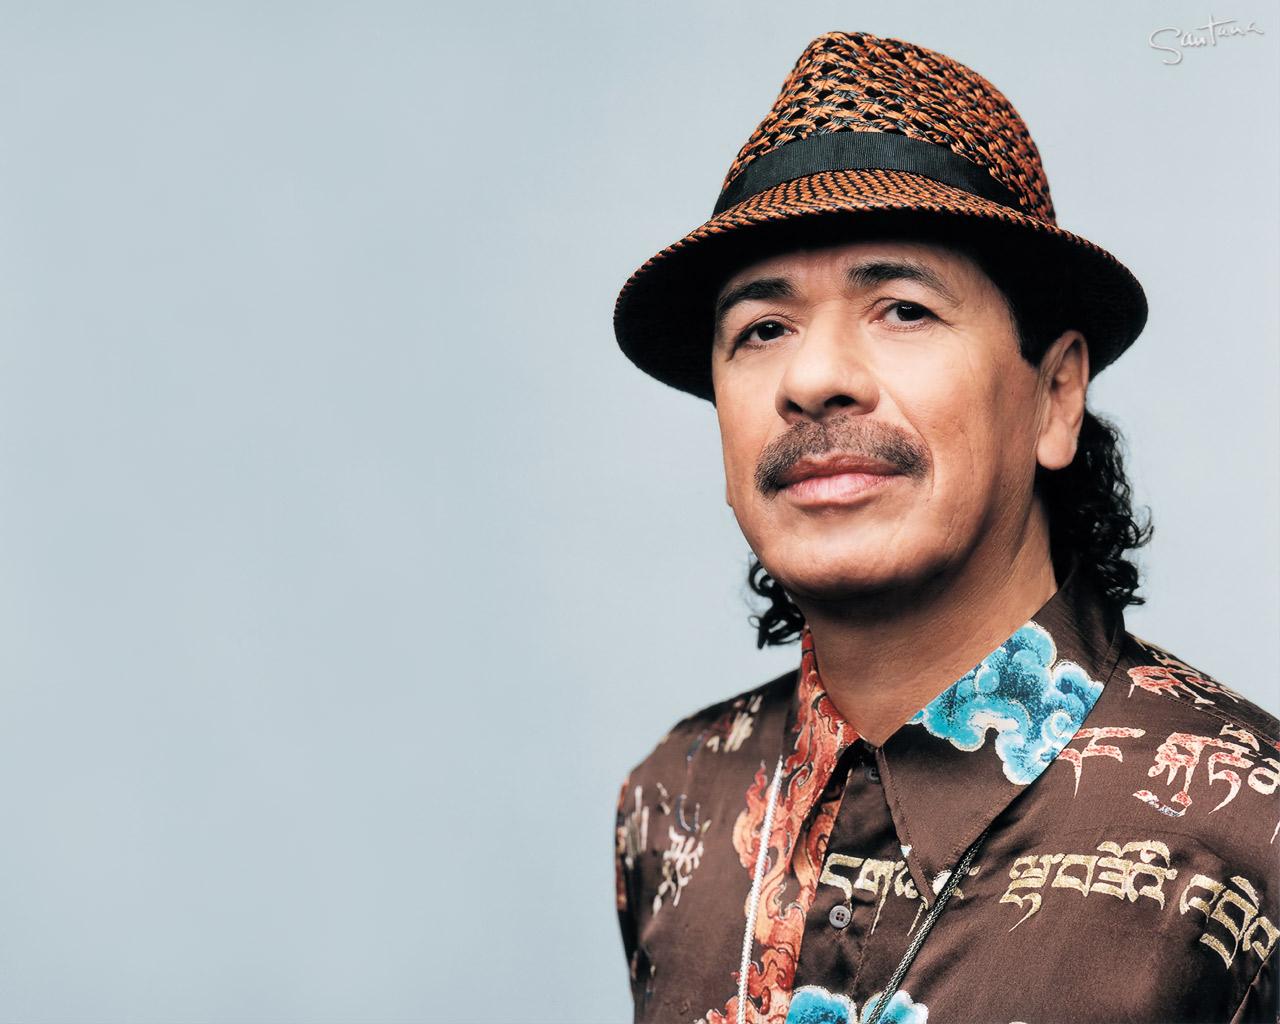 Carlos Santana's quote #4